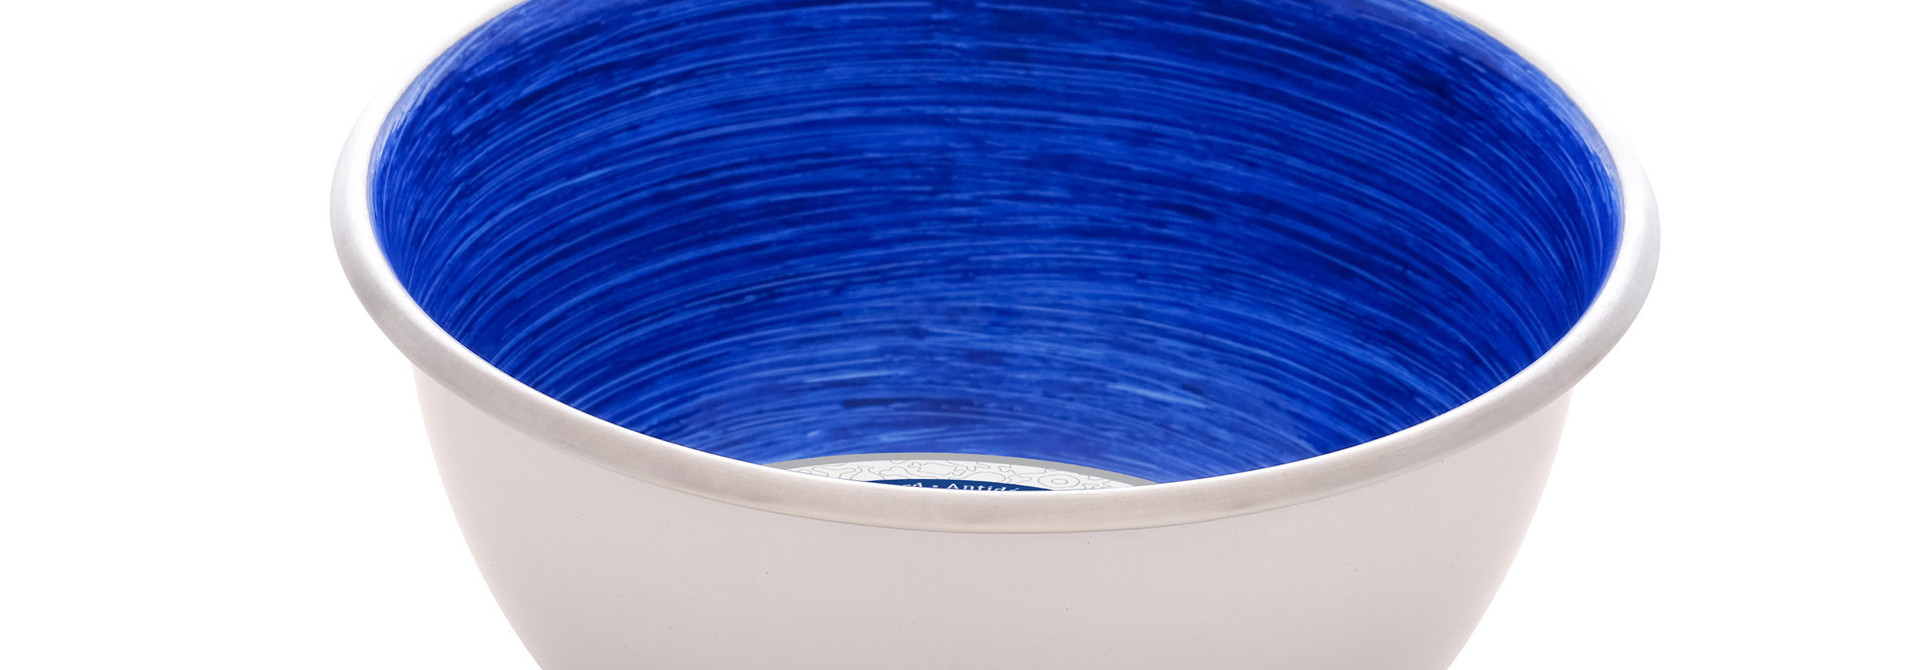 DO SS Bowl,Fashion Design,Blue,500ml